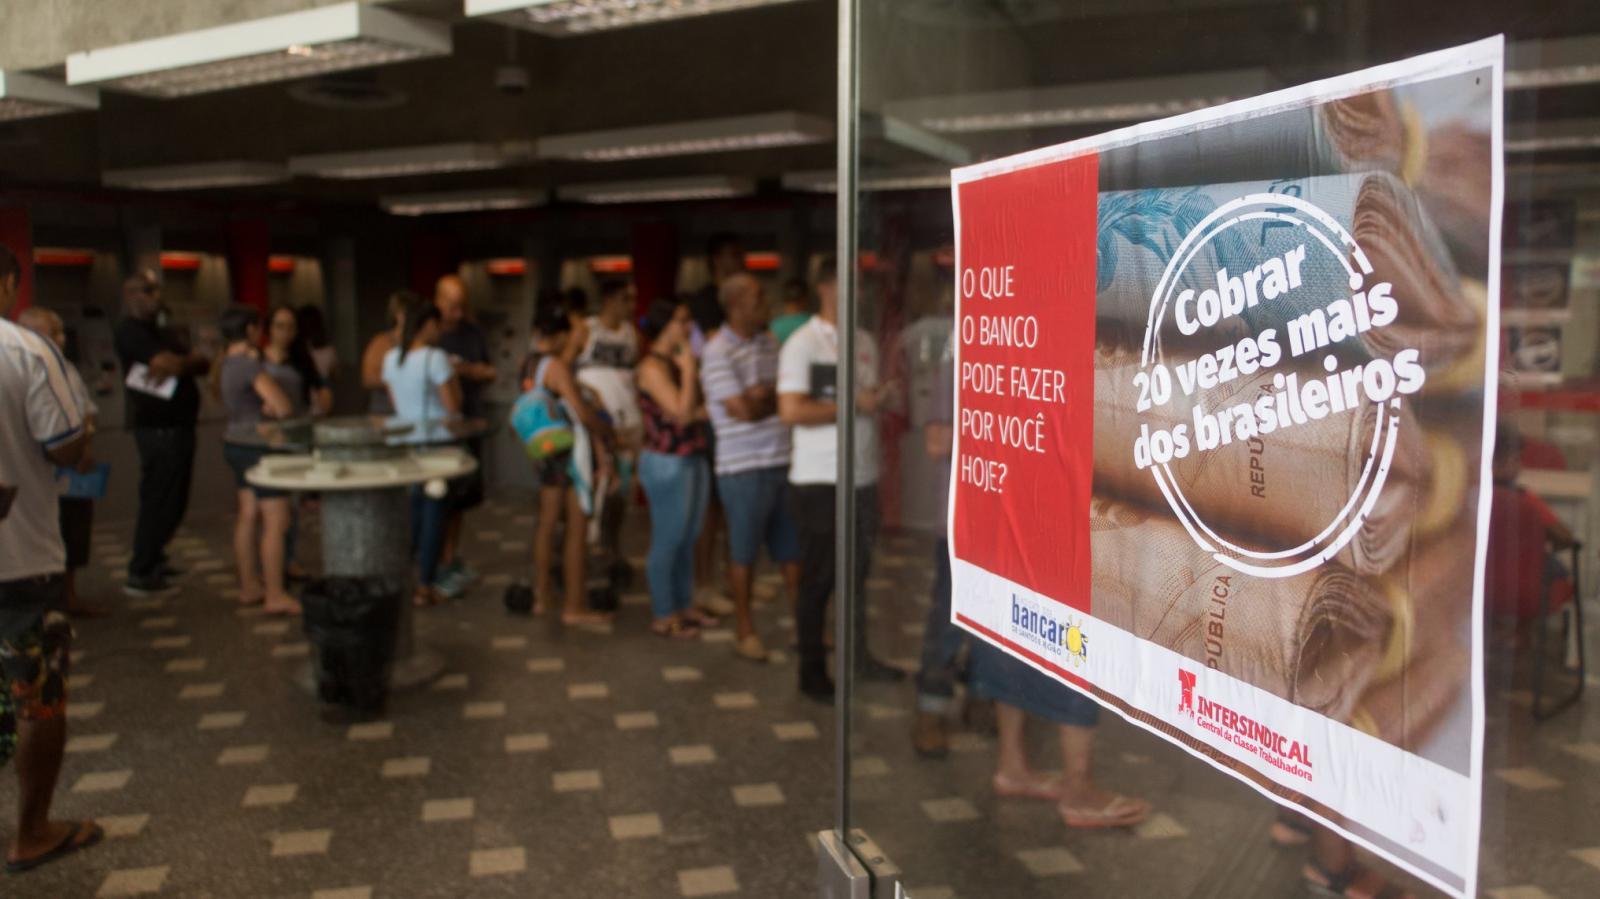 Bancários Santander: ano que acaba nos deixará mais fortes. Que venha o próximo!